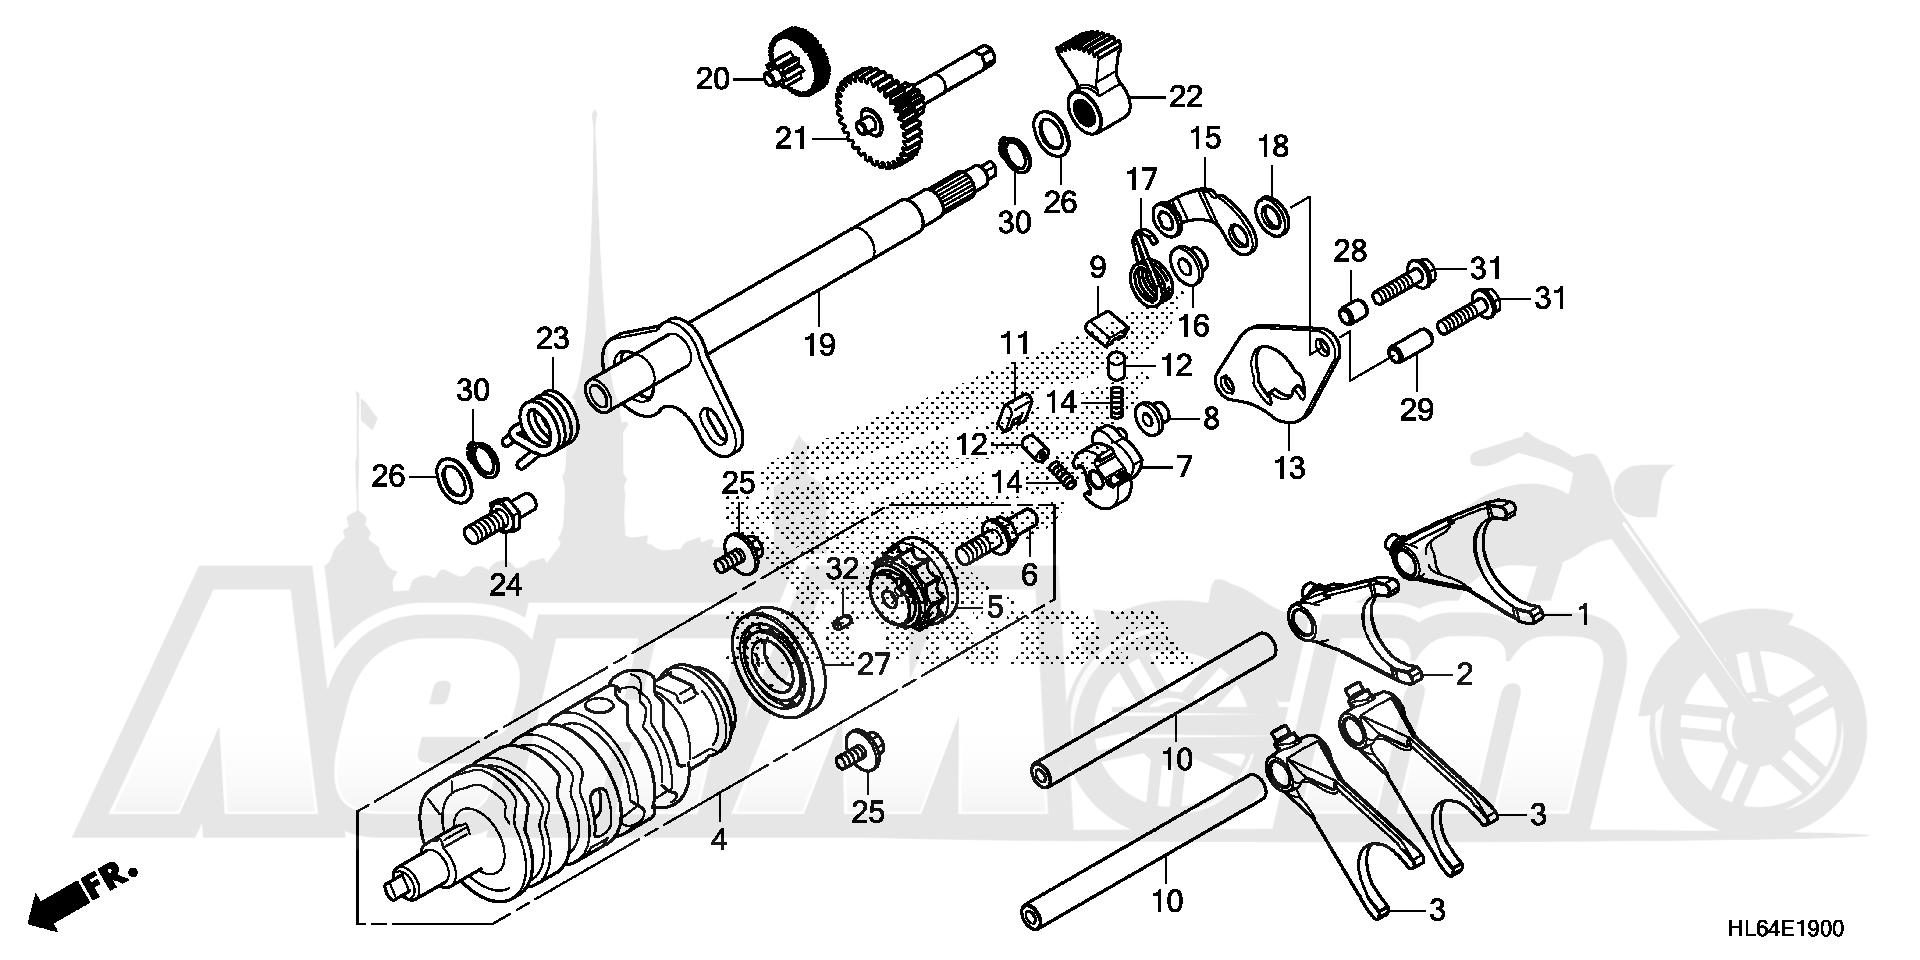 Запчасти для Квадроцикла Honda 2019 SXS1000S2R Раздел: GEARSHIFT FORK | переключение передач вилка